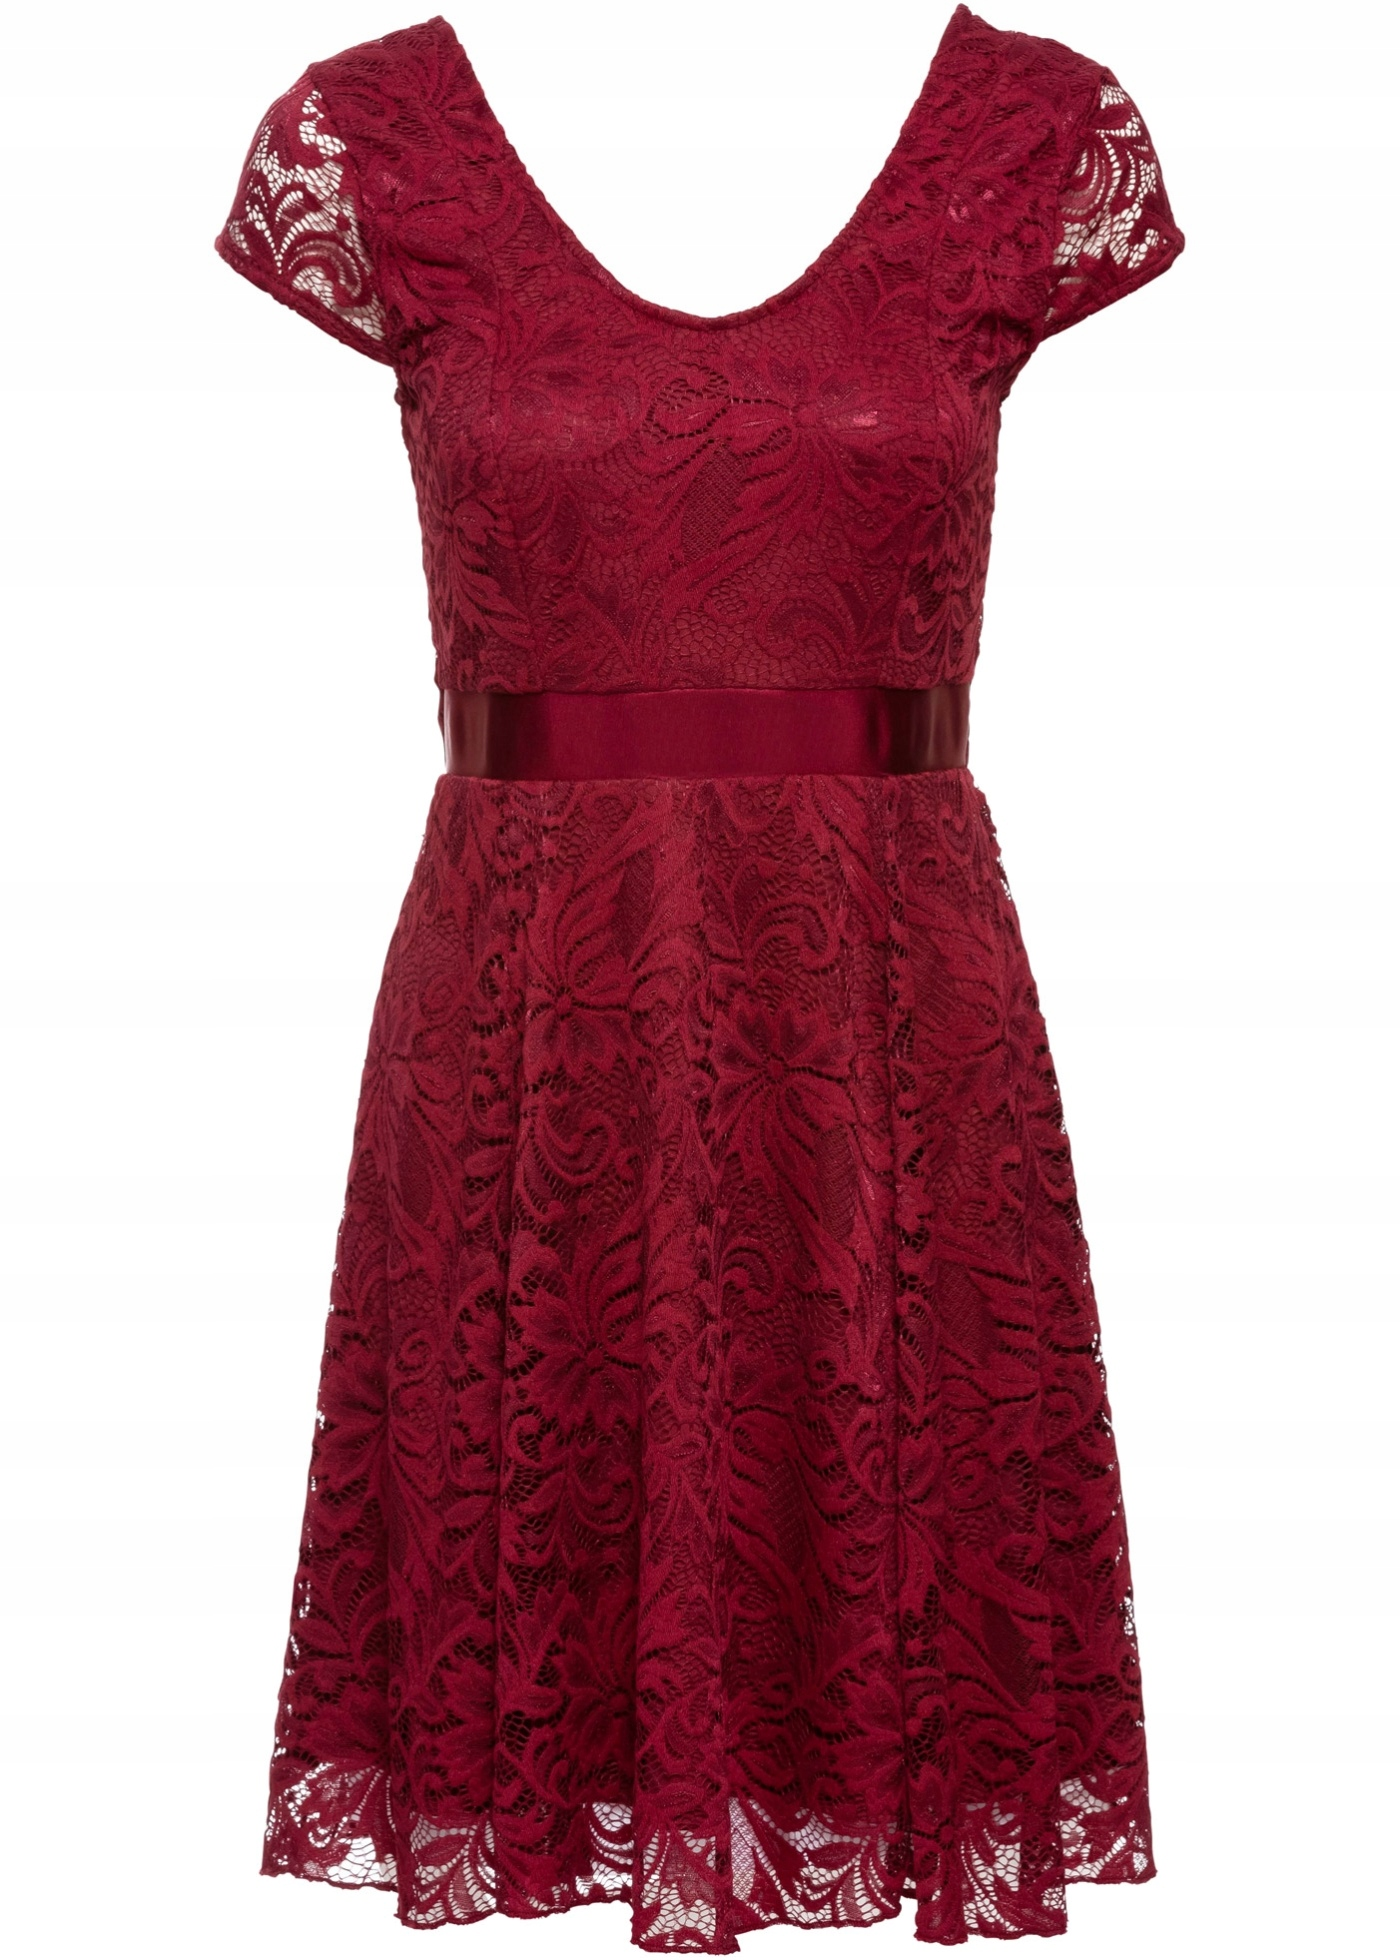 0b789c99 Bonprix Sukienka koronkowa r 36/38 BODYFLIRT - 7705318219 ...